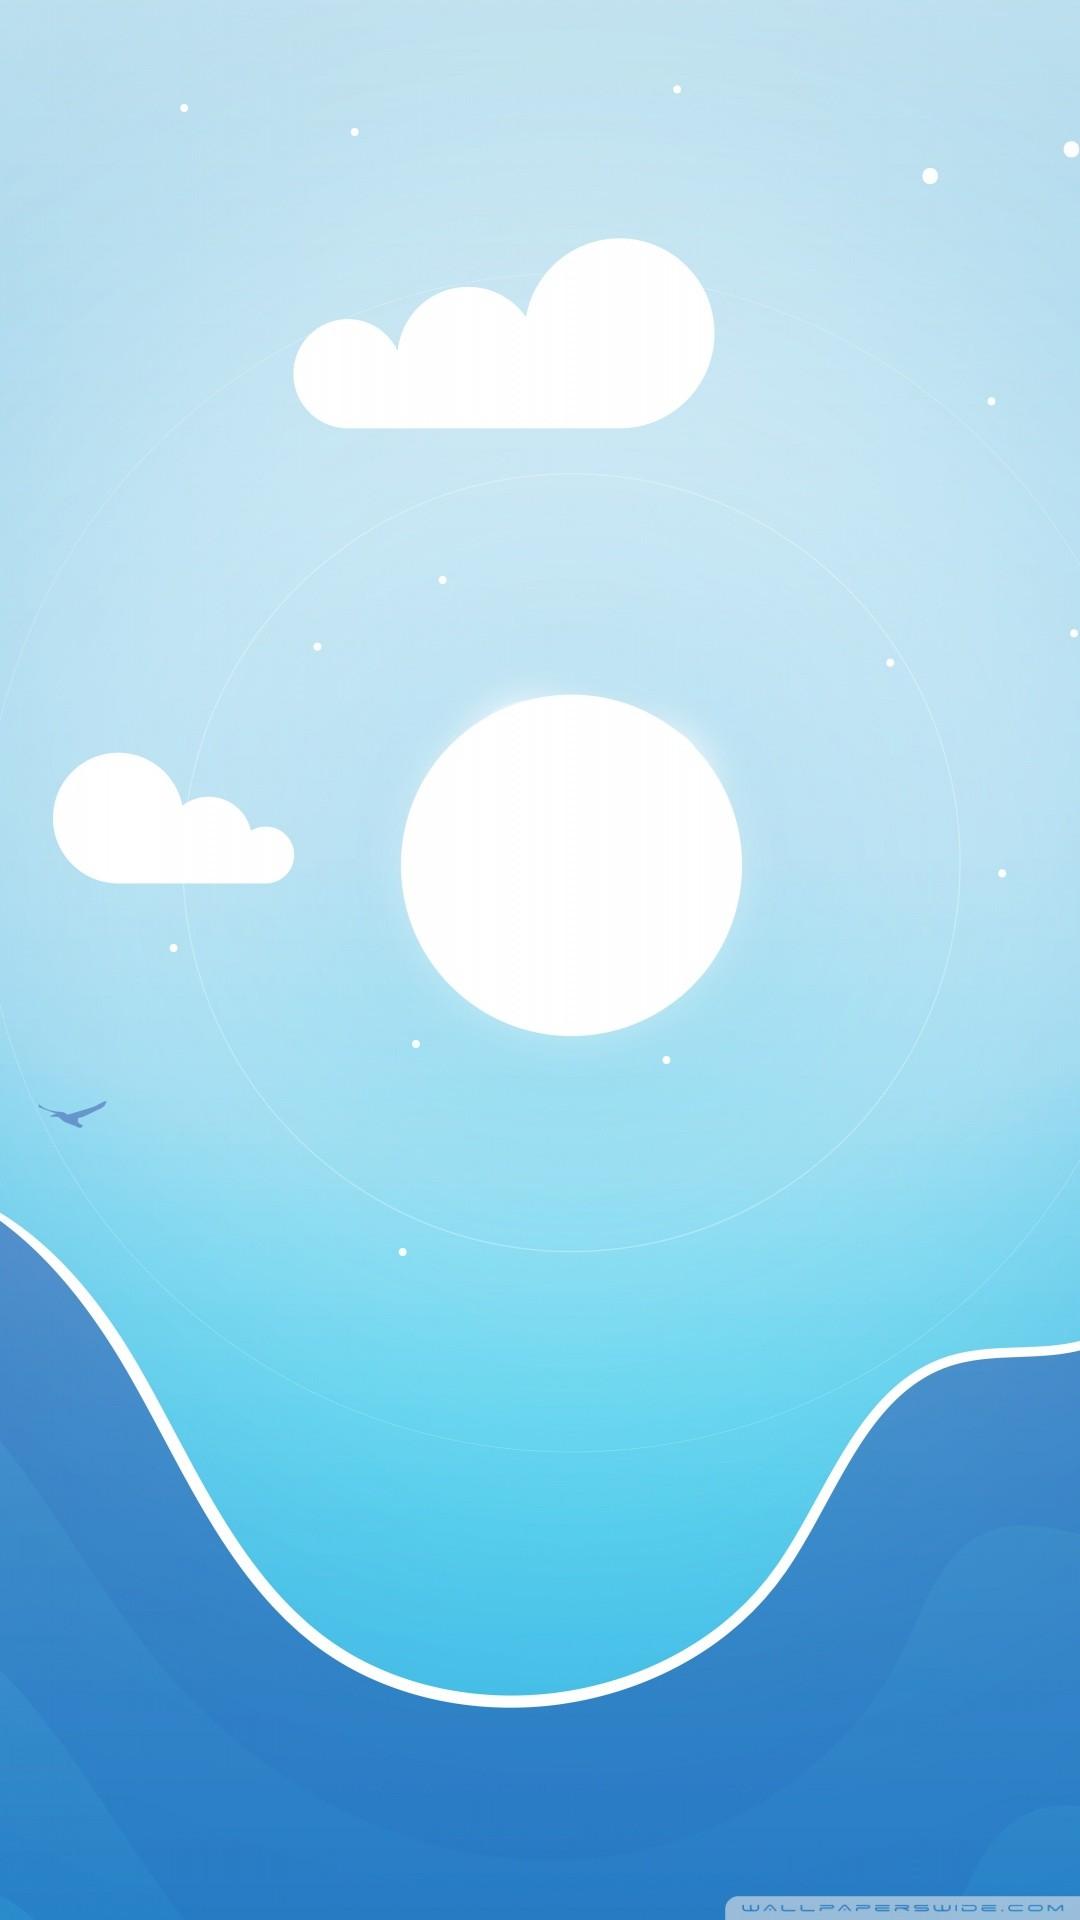 Free Simple Landscape Illustration phone wallpaper by katelyn7